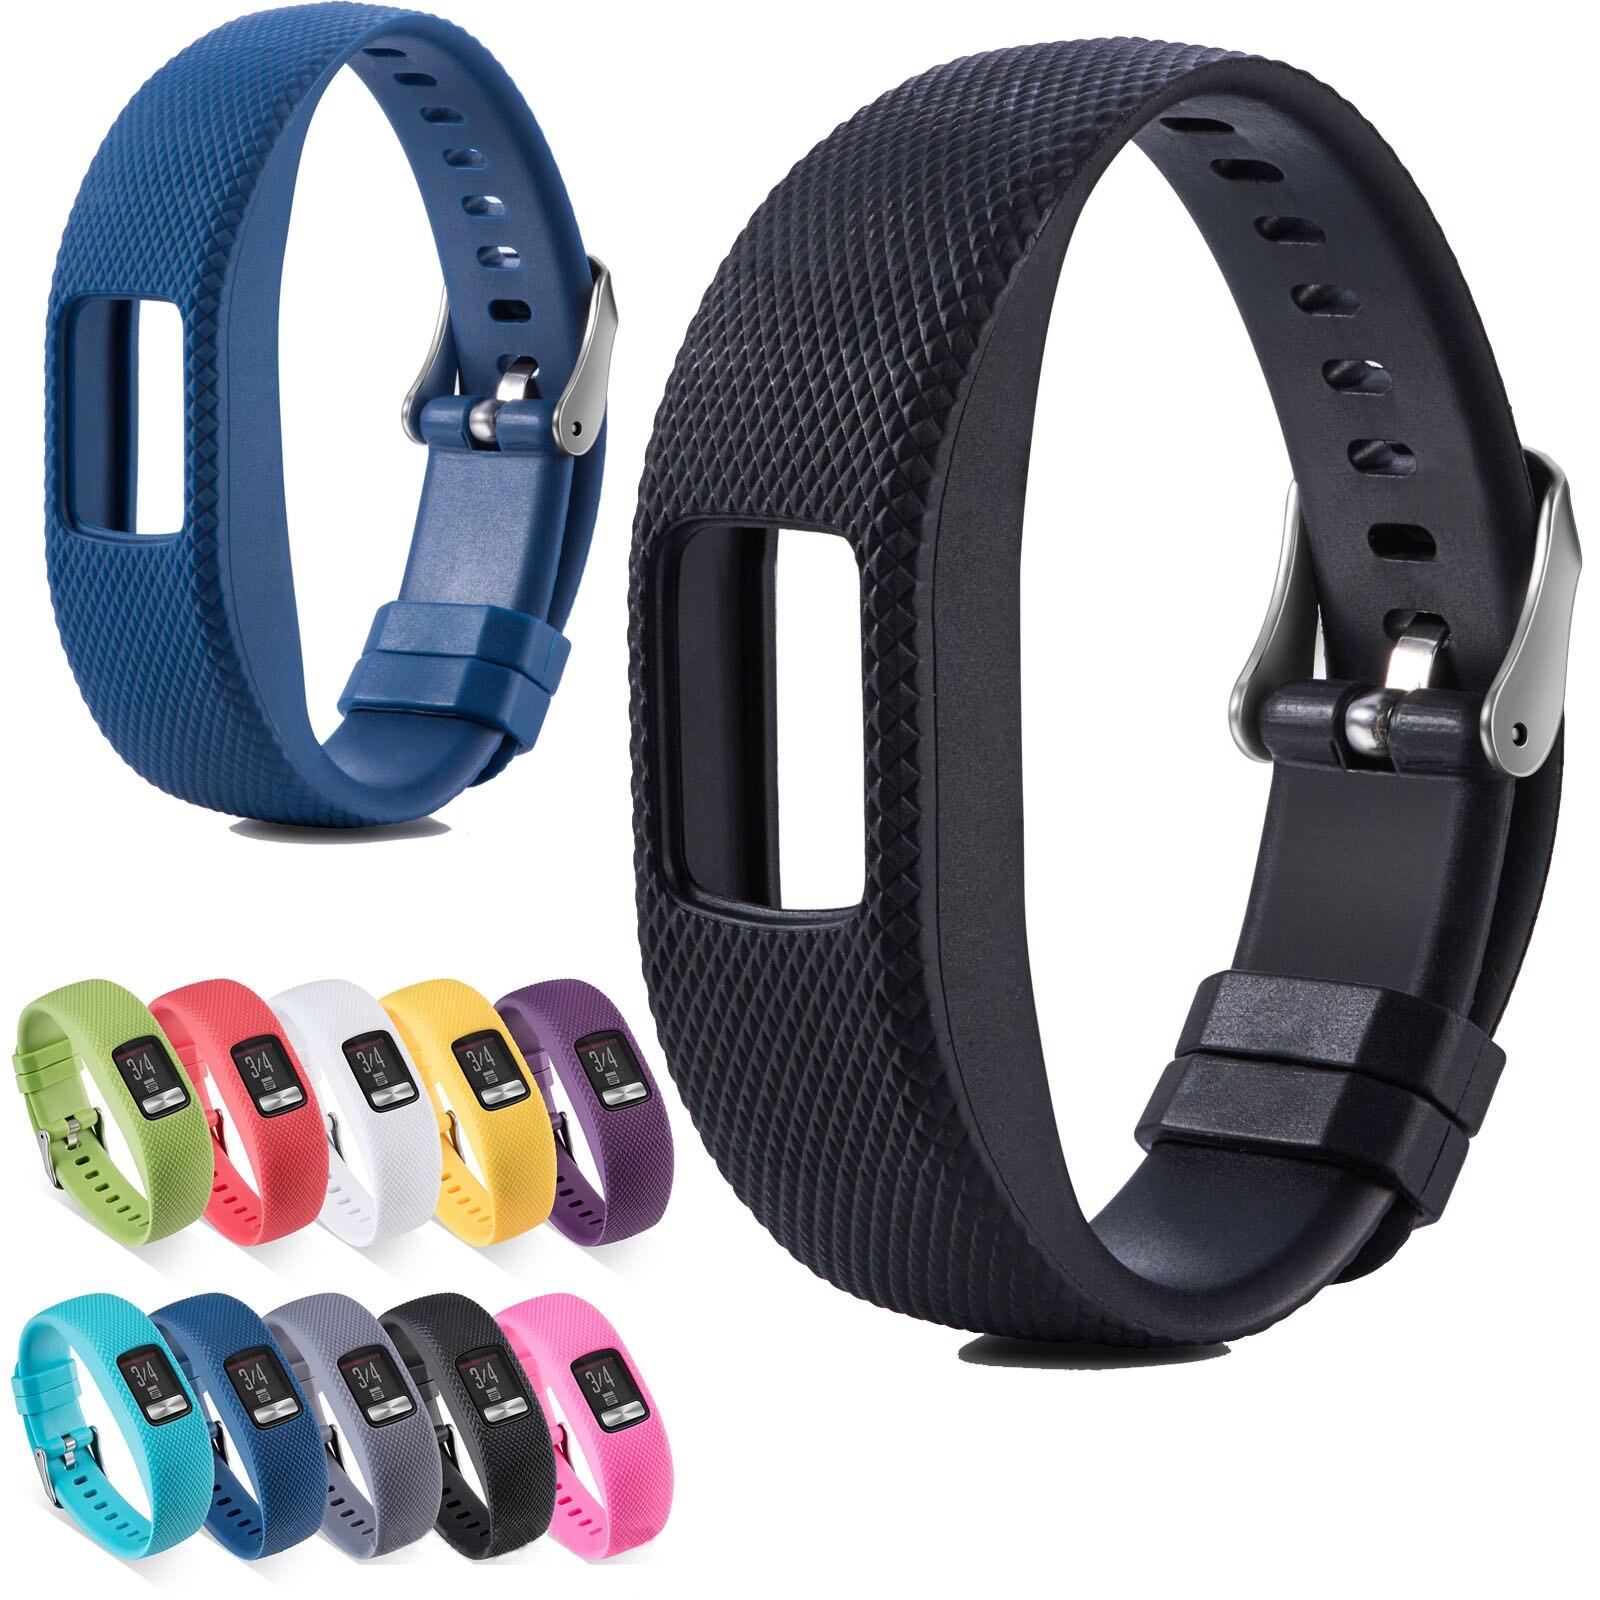 Silicone Watch Band For Garmin Vivofit 4 Sport Replacement Watch Strap For Garmin Vivofit4 Band Plaid Pattern Rubber Bracelet